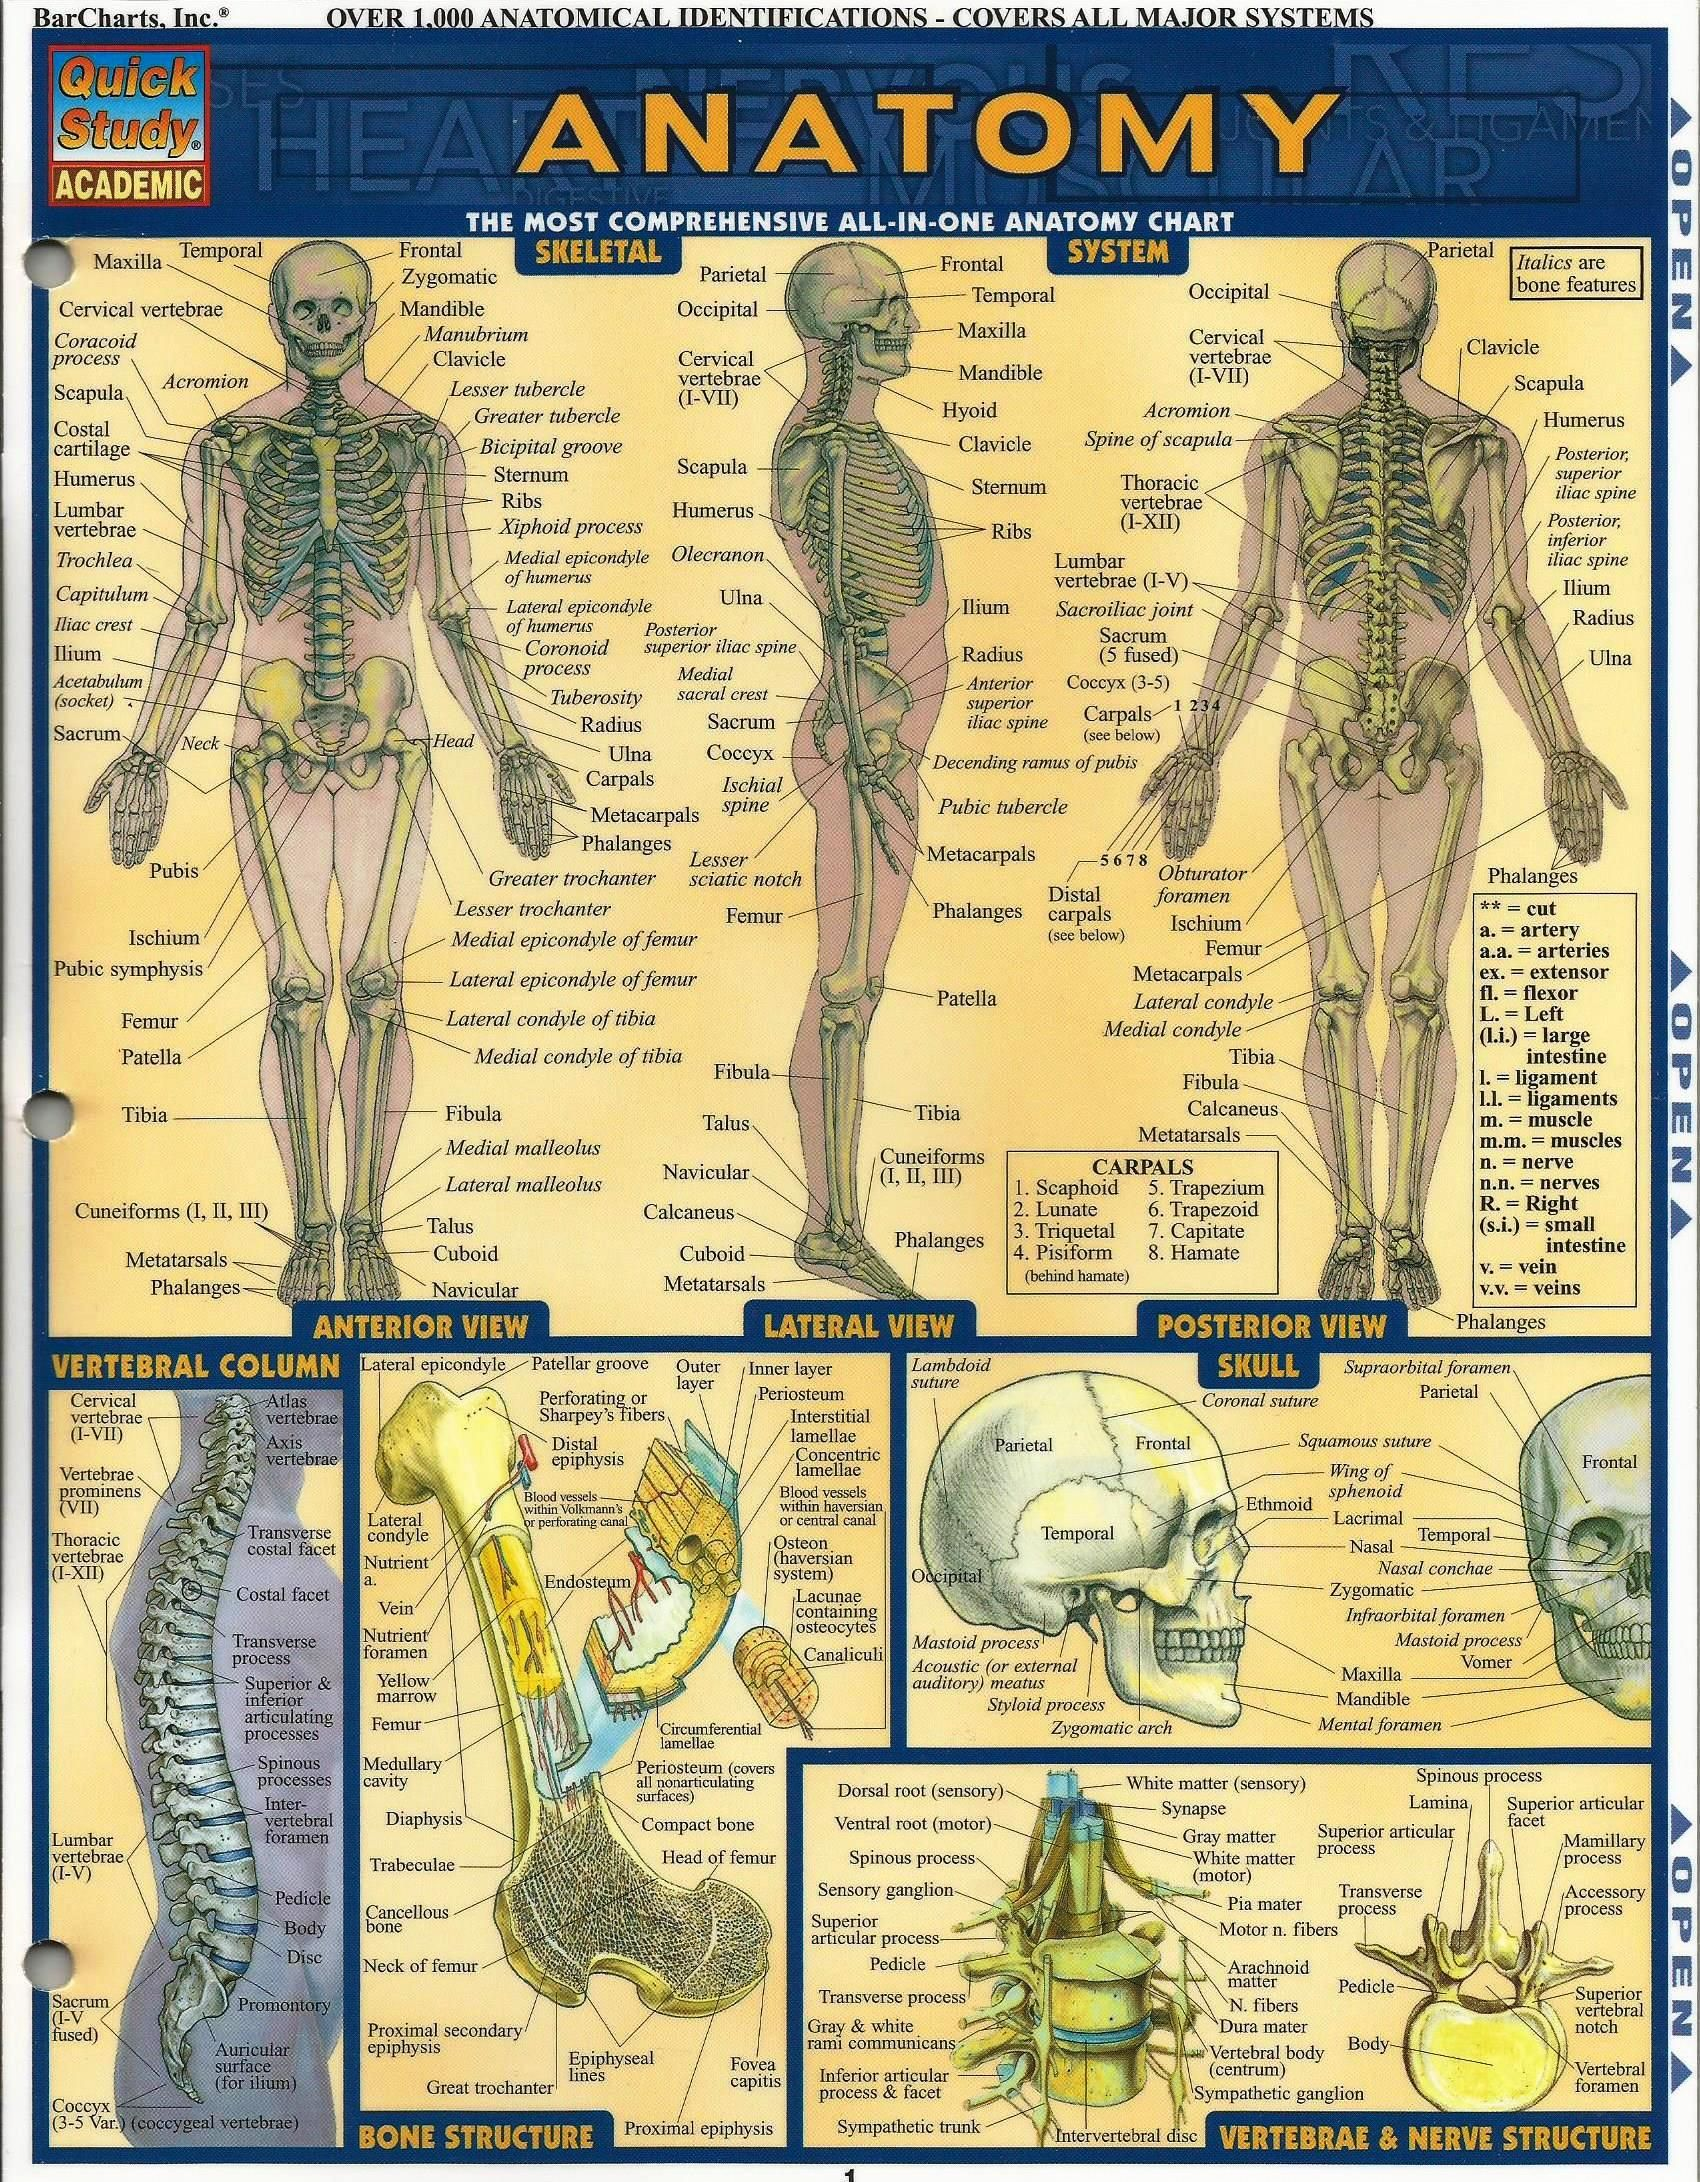 Anatomy of Bone Structure | INFOGRAPHICS | Pinterest | Anatomy and ...